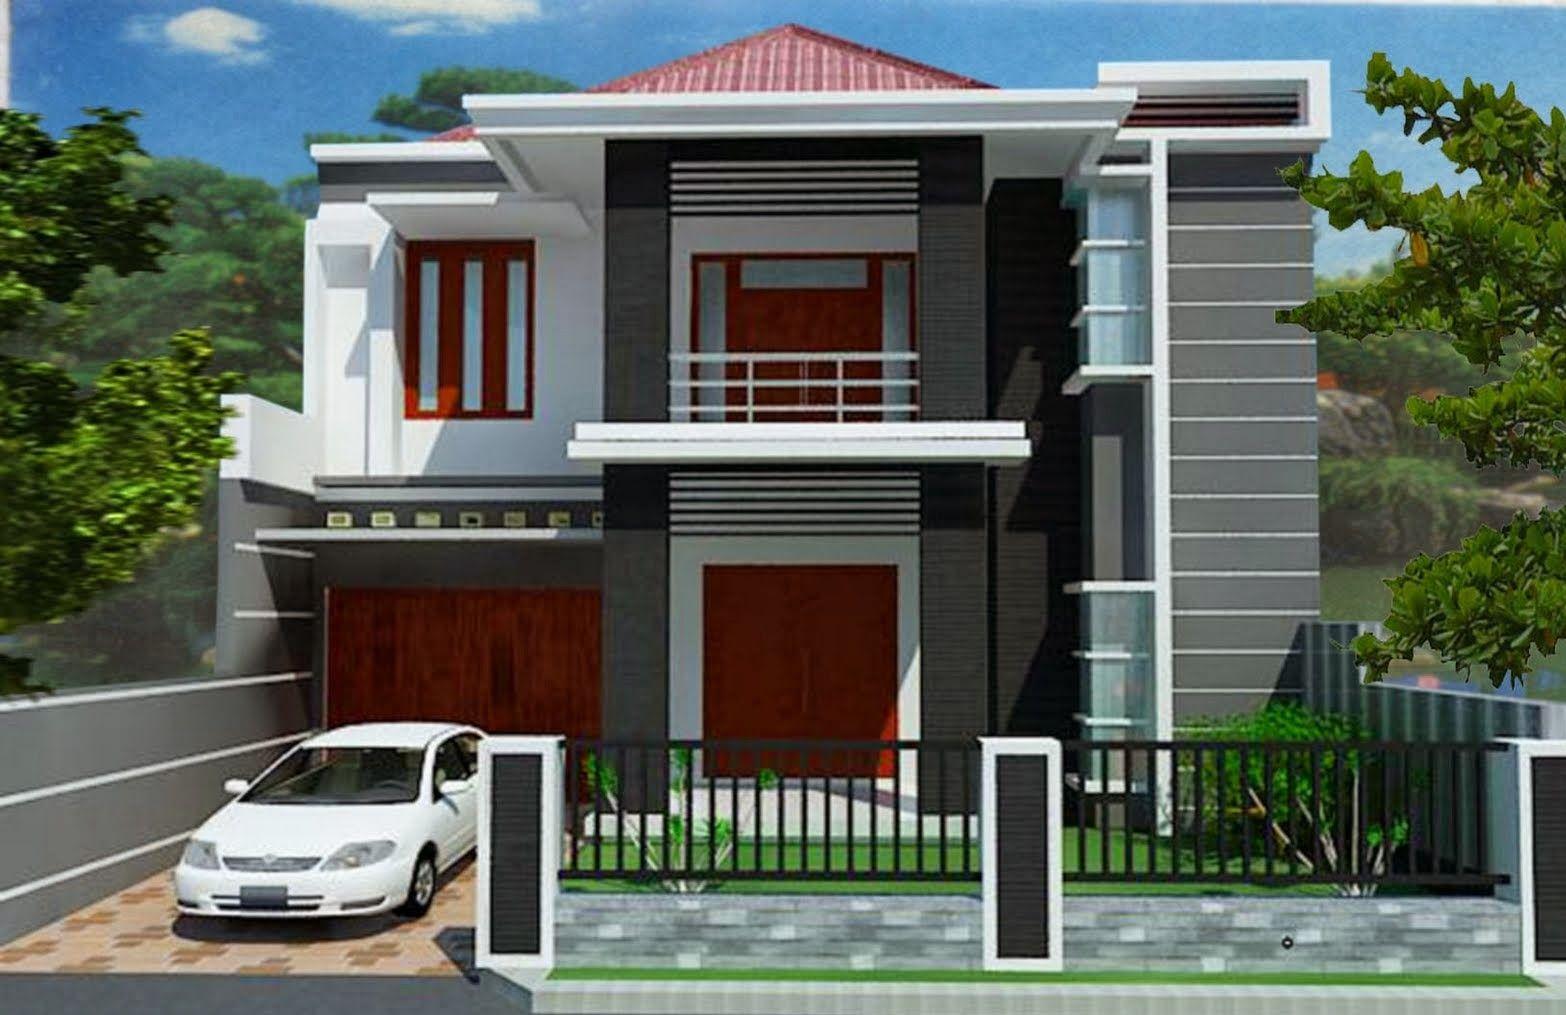 Wonderful Minimalist Design House 2nd Floor | Desain Rumah Minimalis 2 Lantai